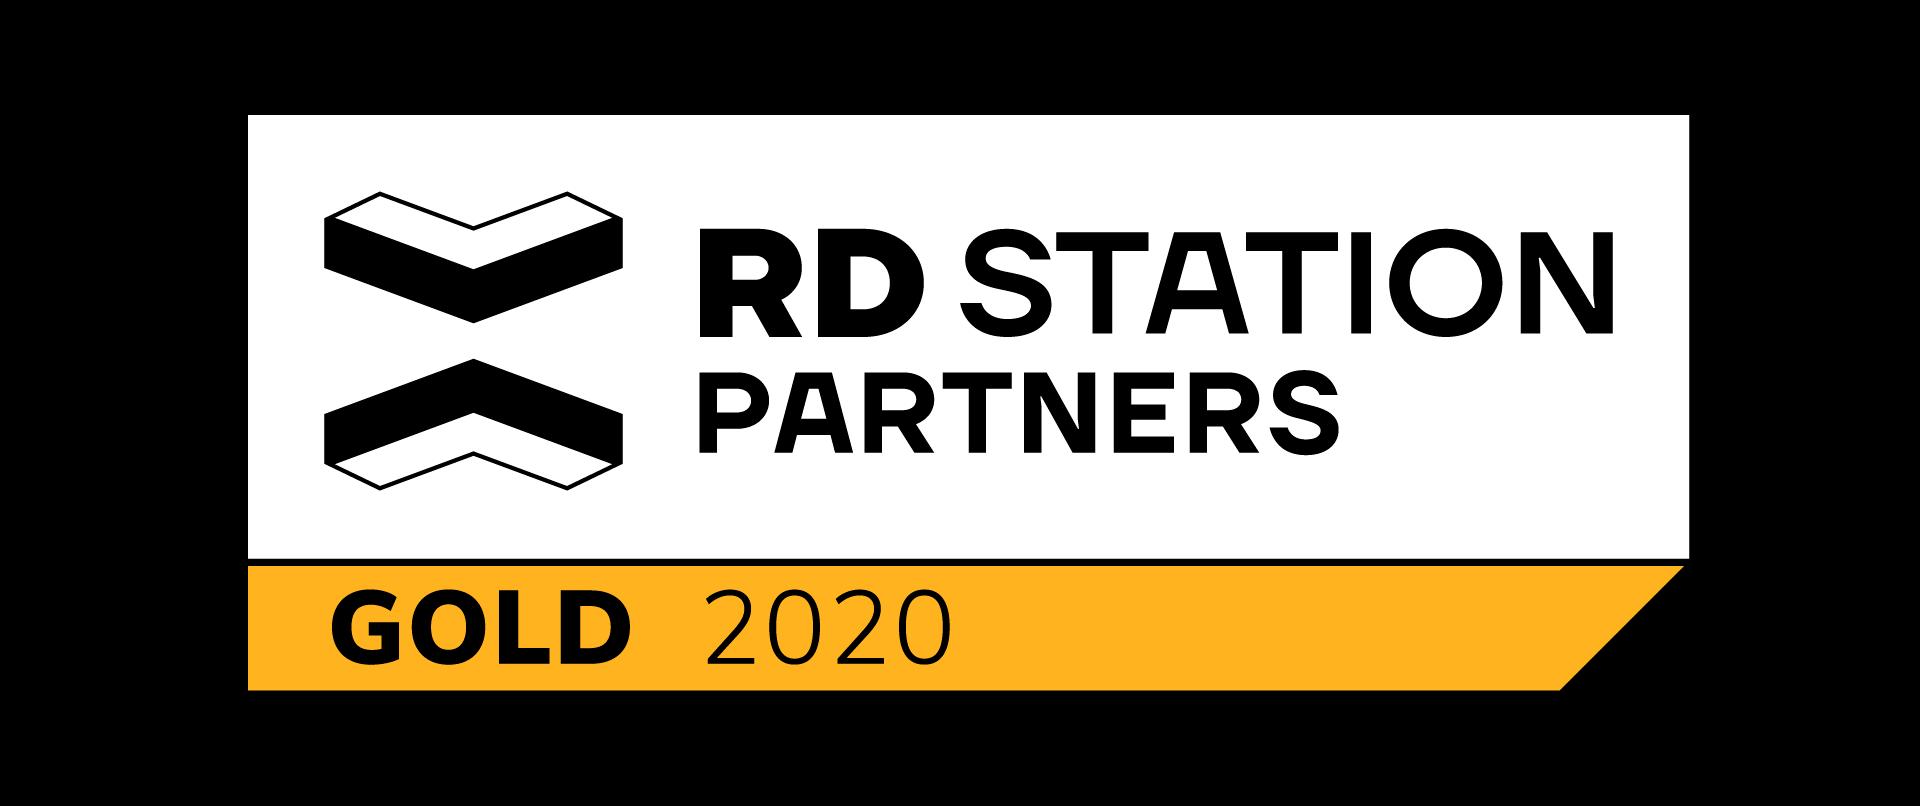 rd-station-marketing-kramas